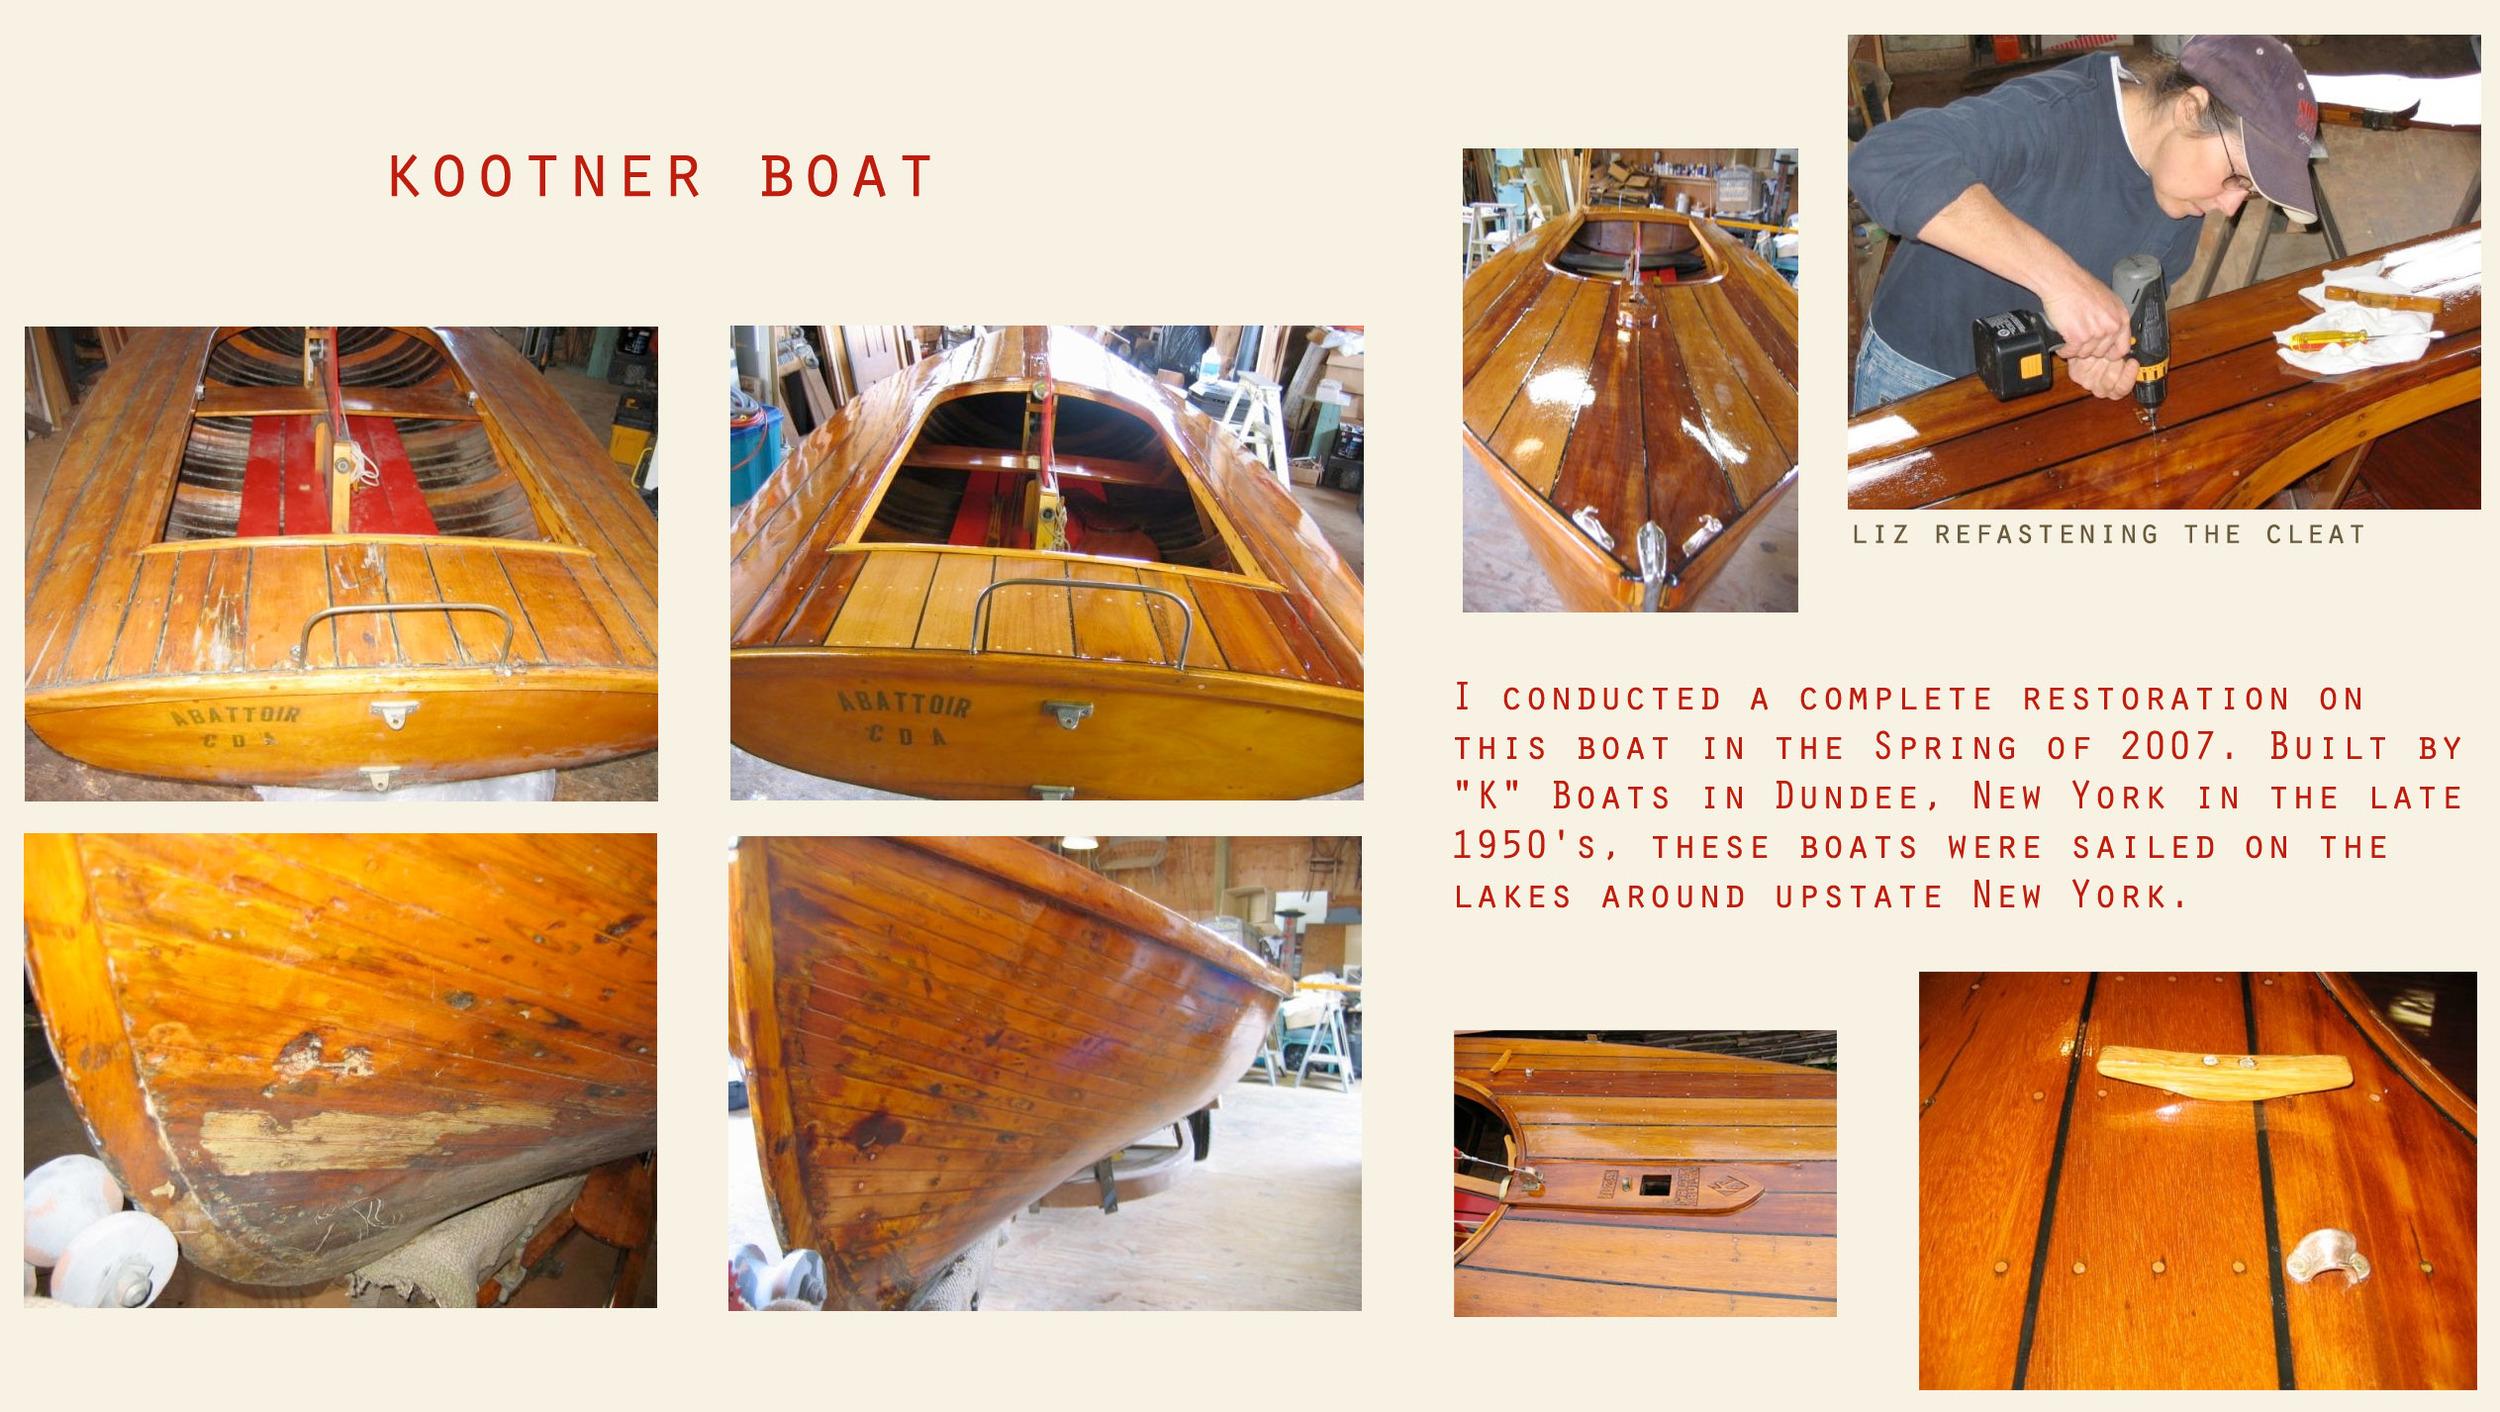 kootner boat.jpg